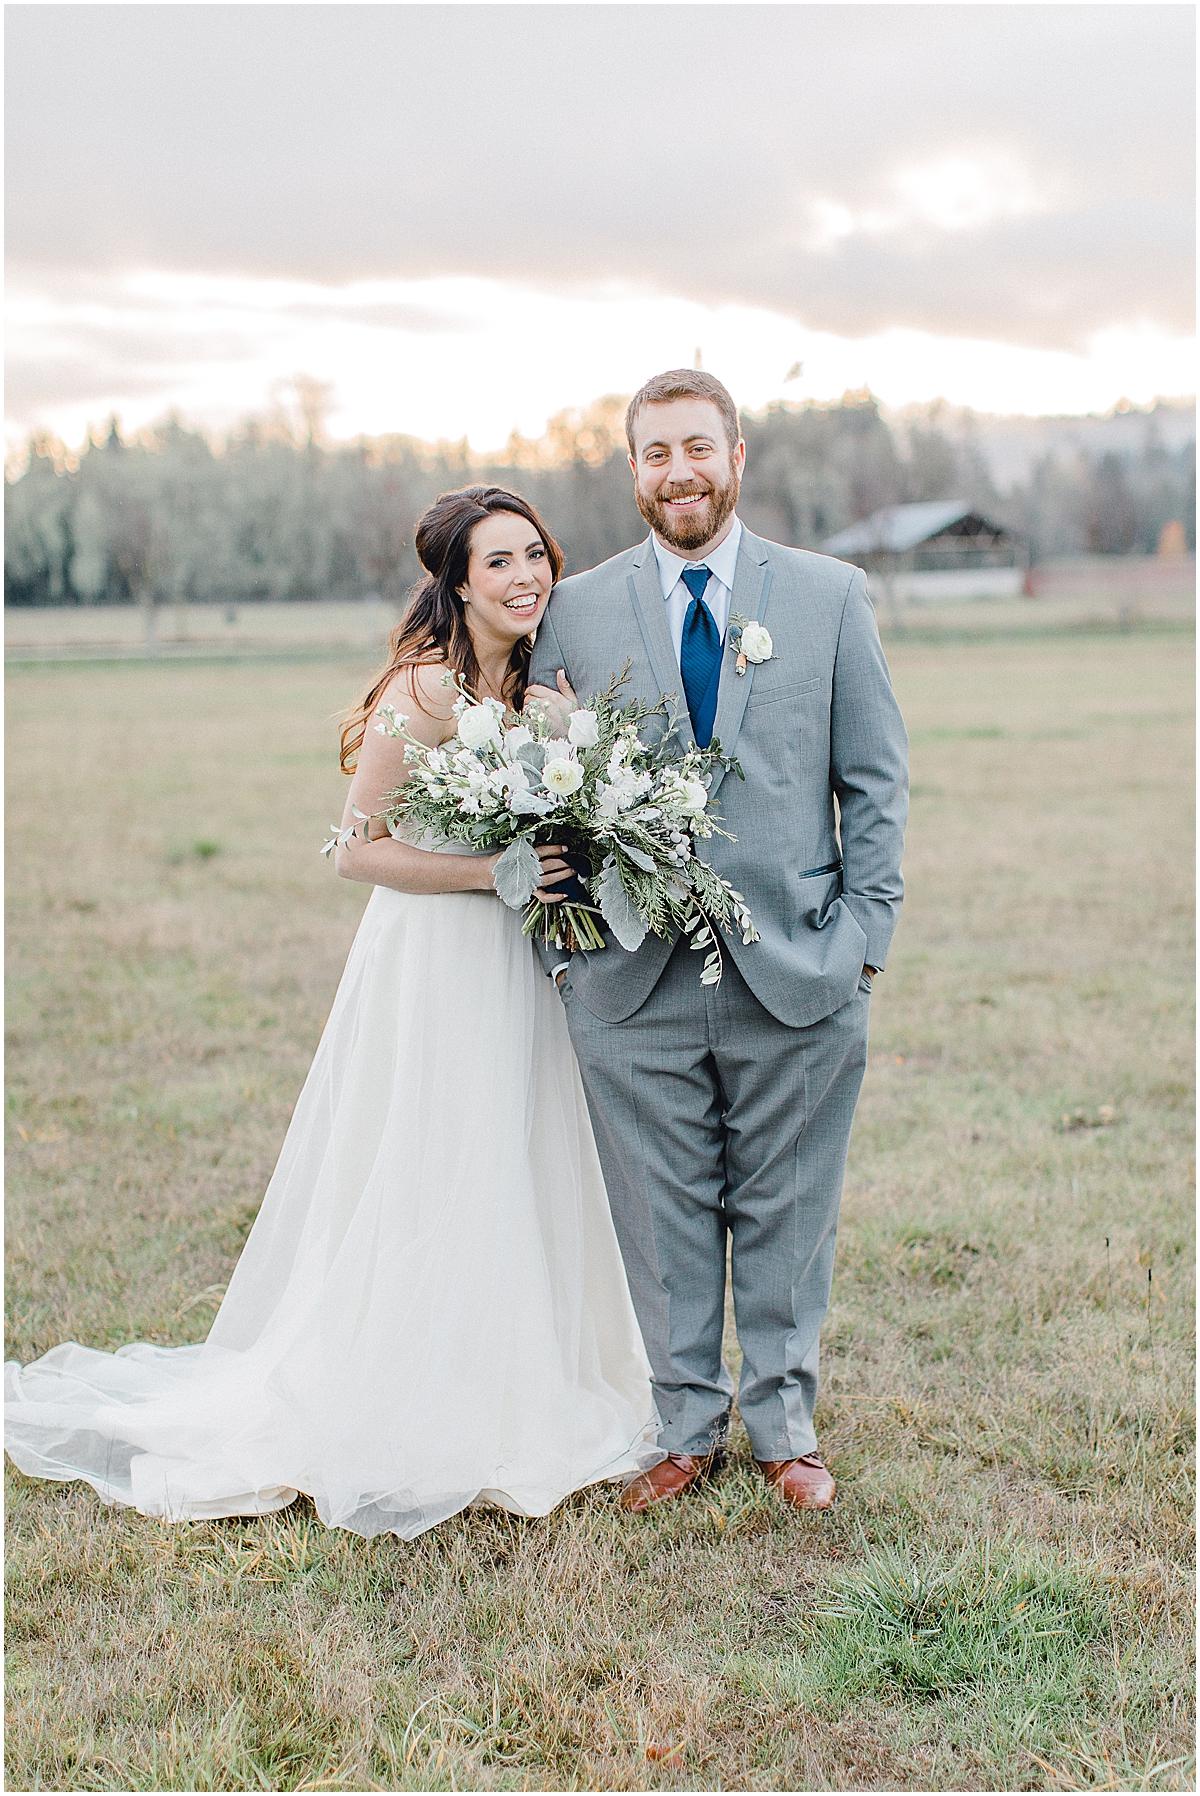 Chehalis Washington Winter Wedding Silver and White | Willapa Hills Farm Wedding | Eastham | Emma Rose Company PNW Light and Airy Wedding Photographer_0083.jpg